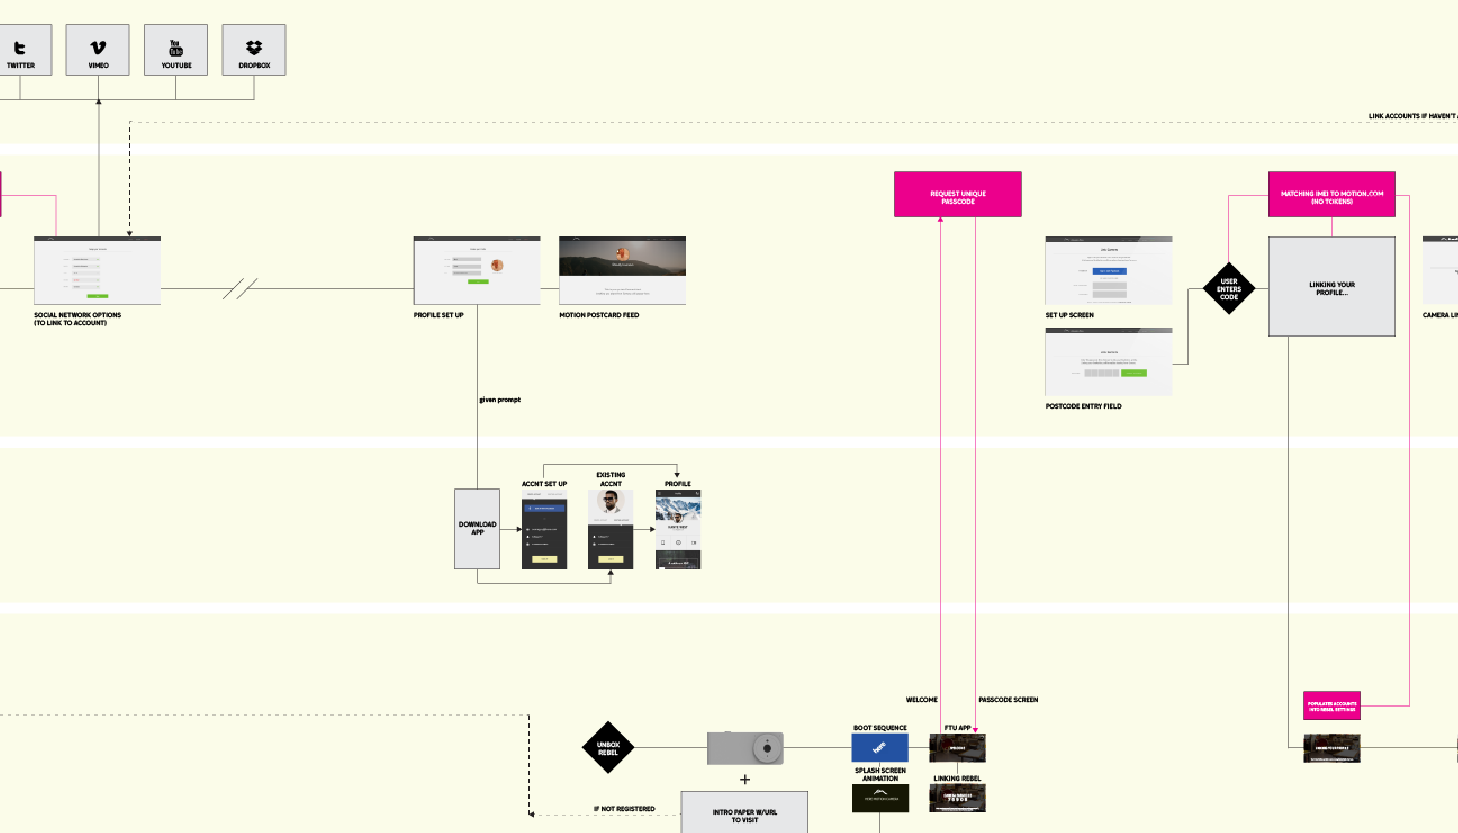 rbl_system_diagram-02.png